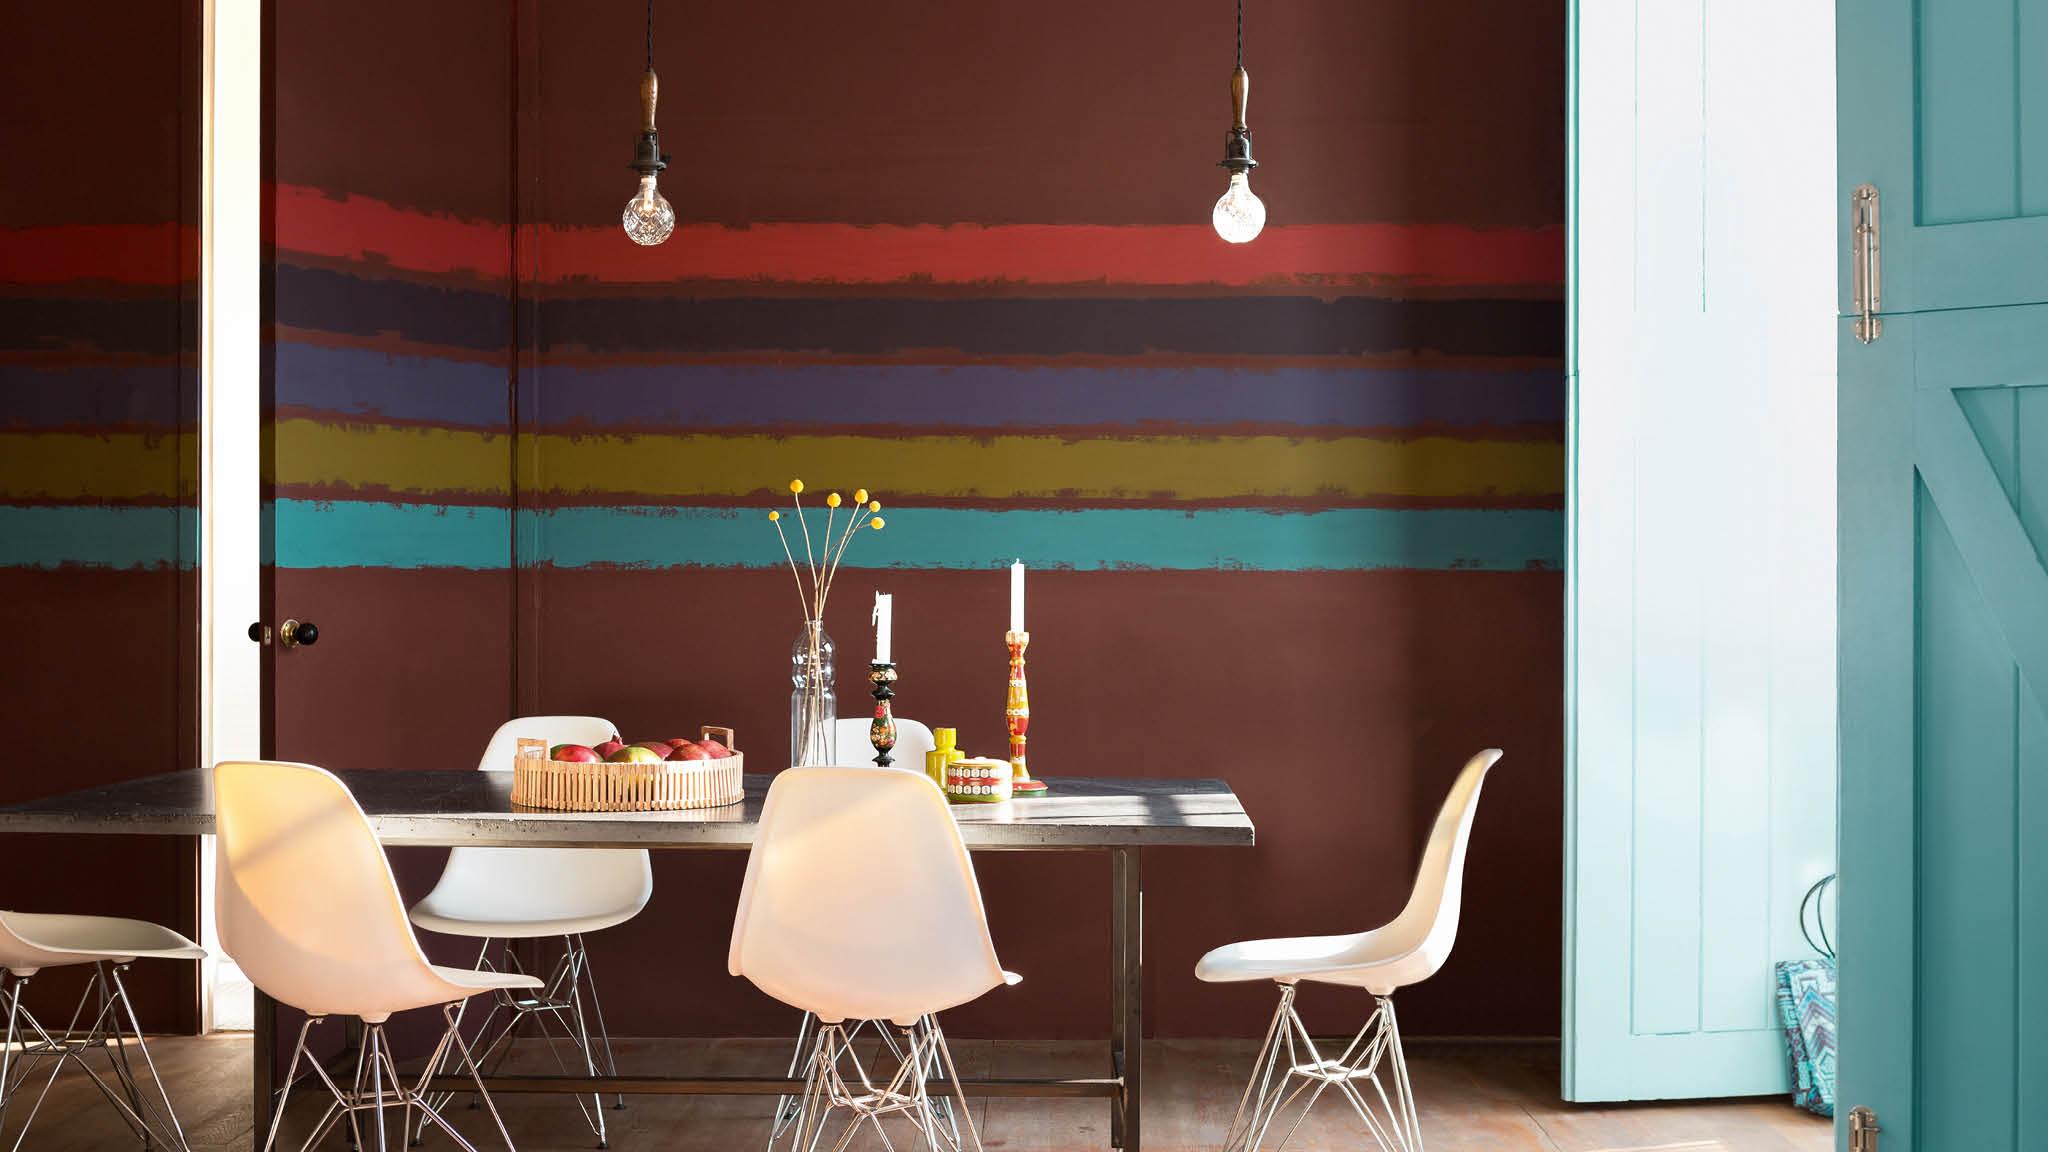 7 Ide Warna Ruang Makan Yang Memikat Untuk Membuat Tamu Jamuan Makan Malam Anda Terkesan Dulux Warna cat rumah makan